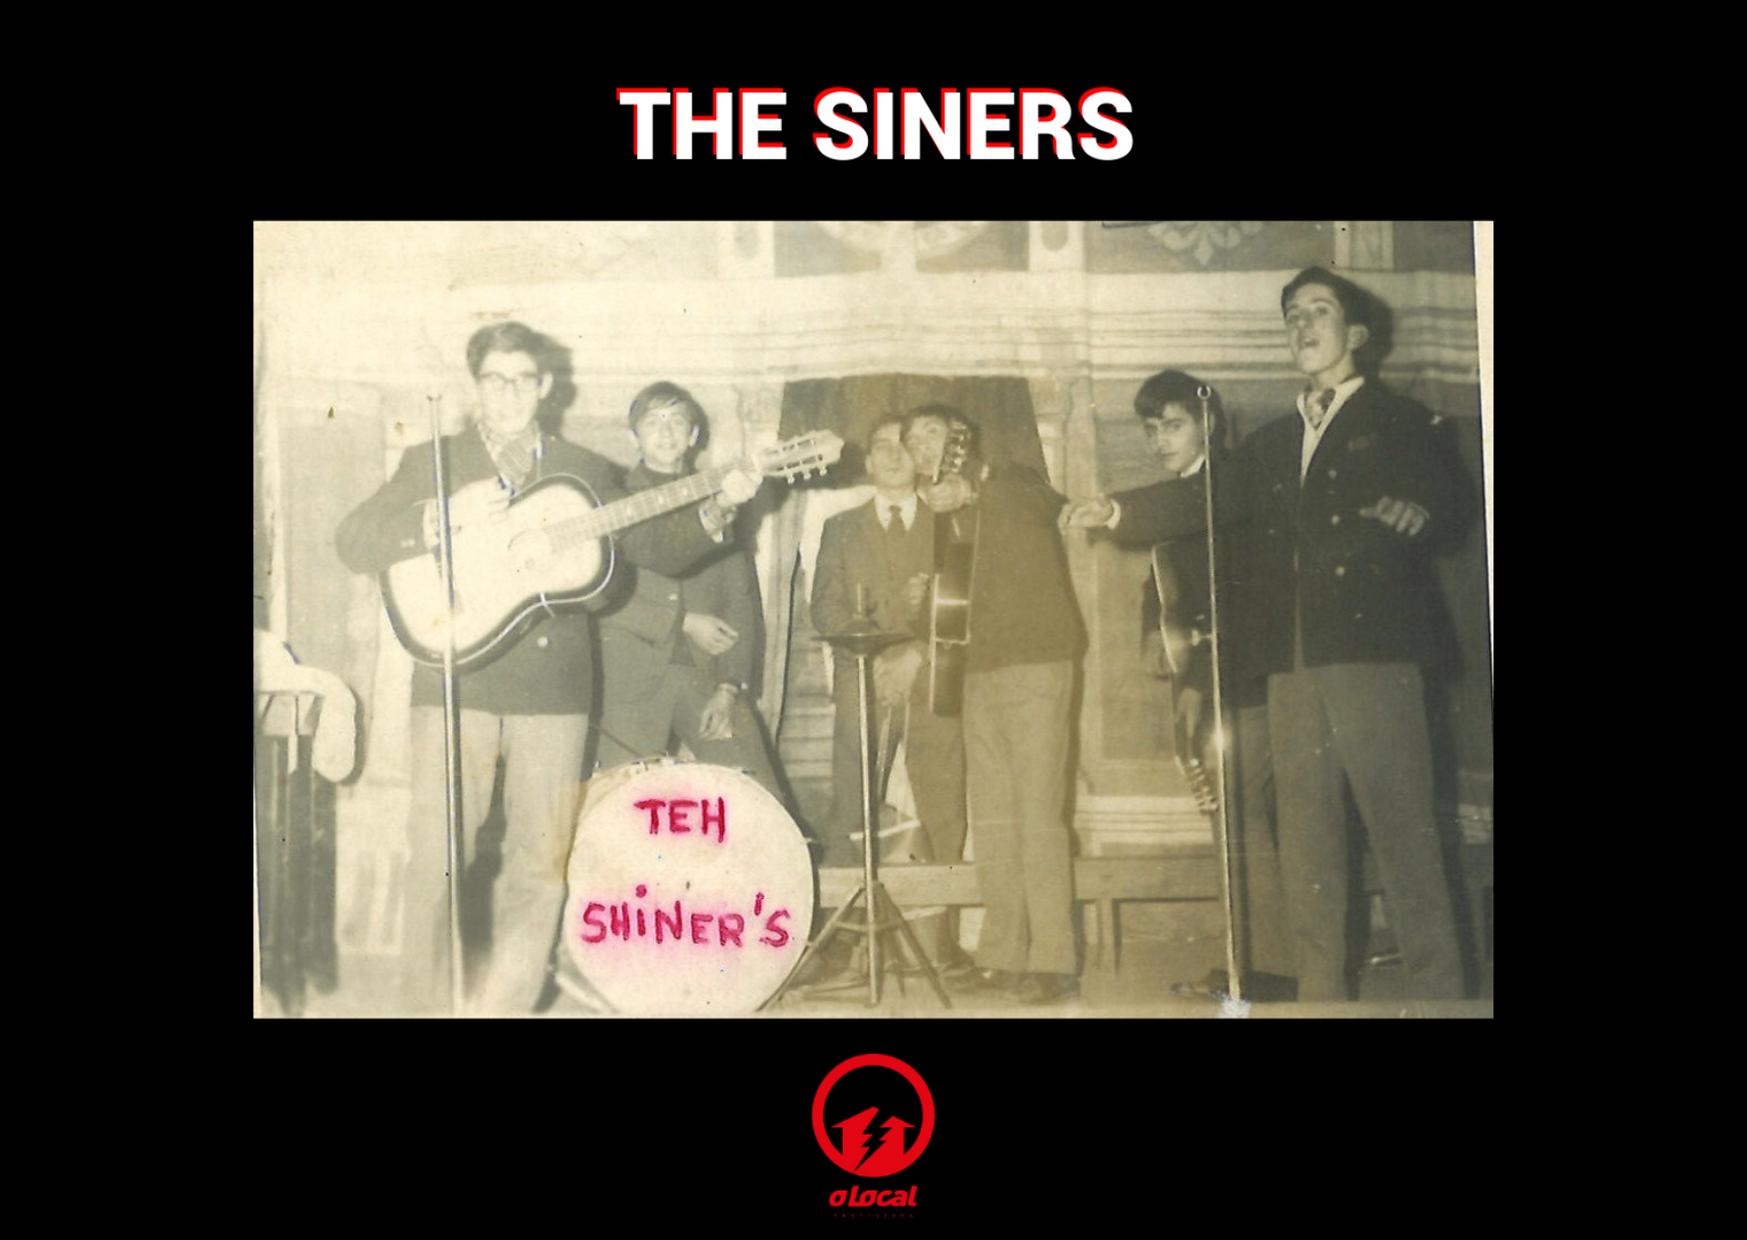 CLASE DE HISTORIA 9: THE SINERS